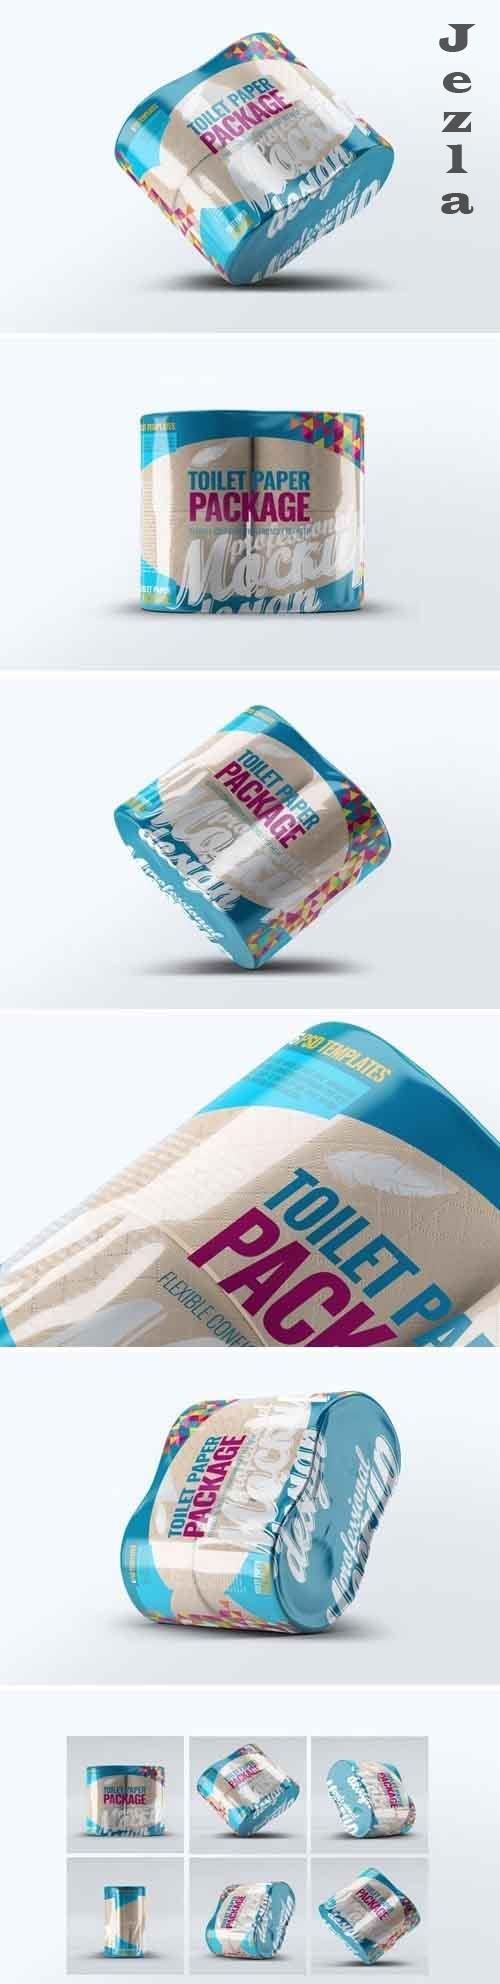 Toilet Paper Package Mock-Up